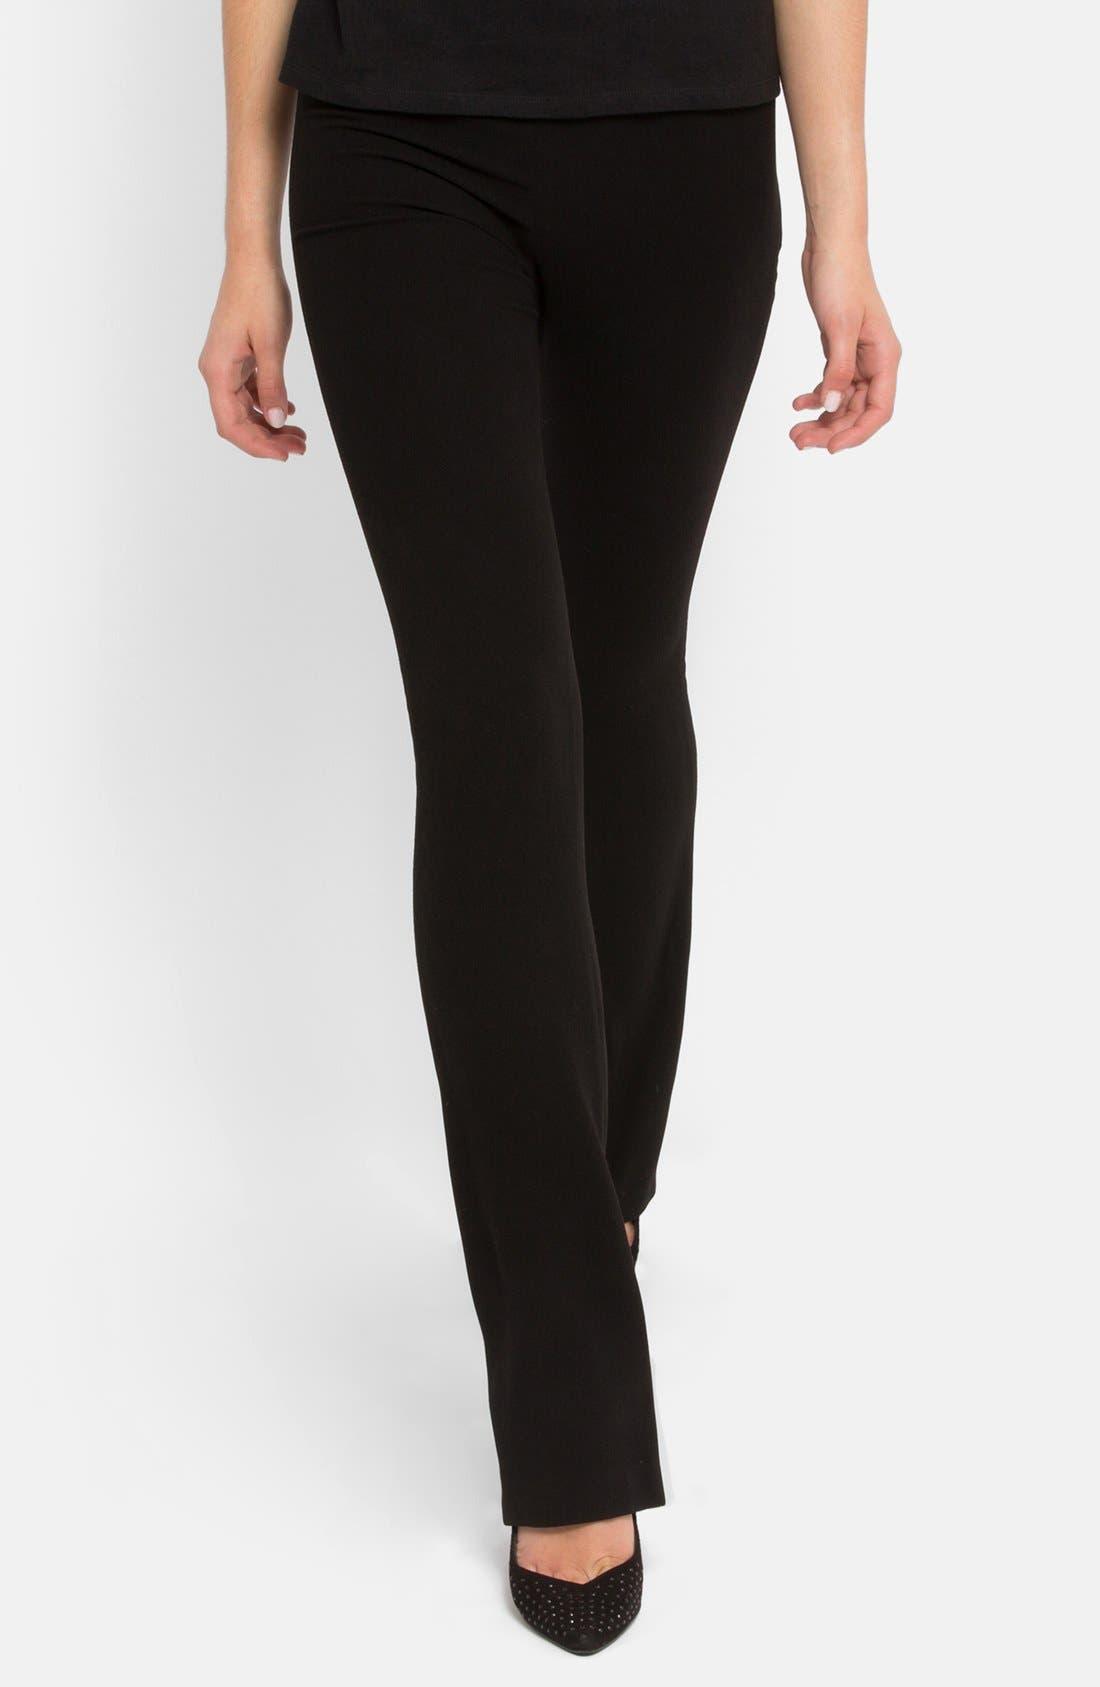 Alternate Image 1 Selected - maje 'Fameux' Pants